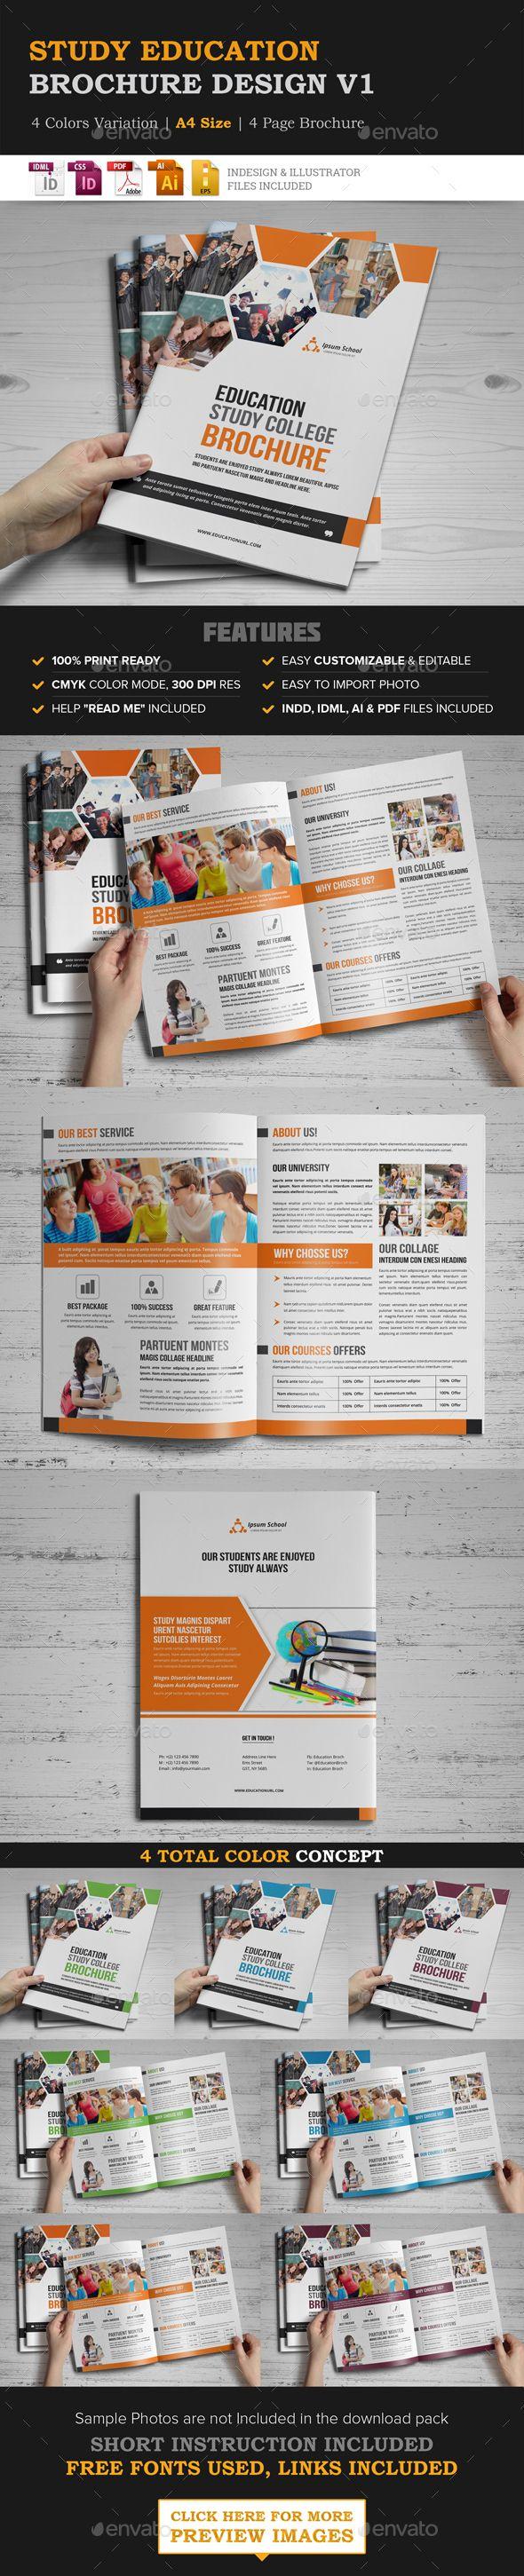 Education Brochure Design Template Vector EPS, InDesign INDD, AI Illustrator. Download here: http://graphicriver.net/item/education-brochure-design/16597539?ref=ksioks